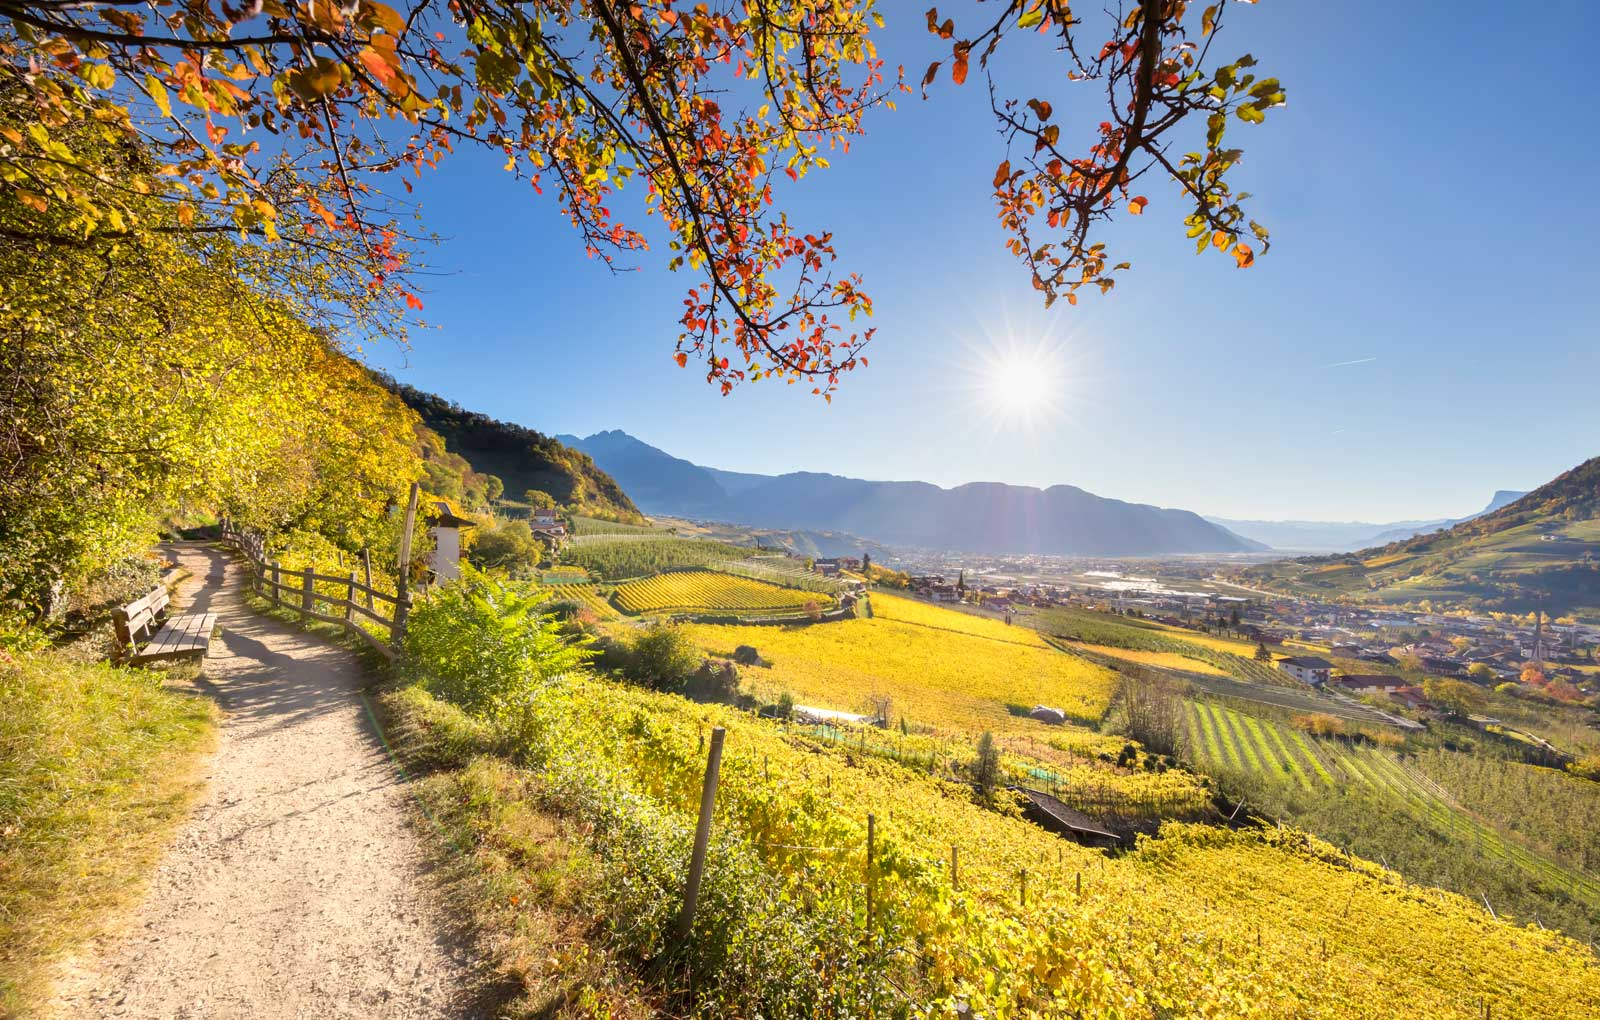 Wandern in Südtirol - Pünthof